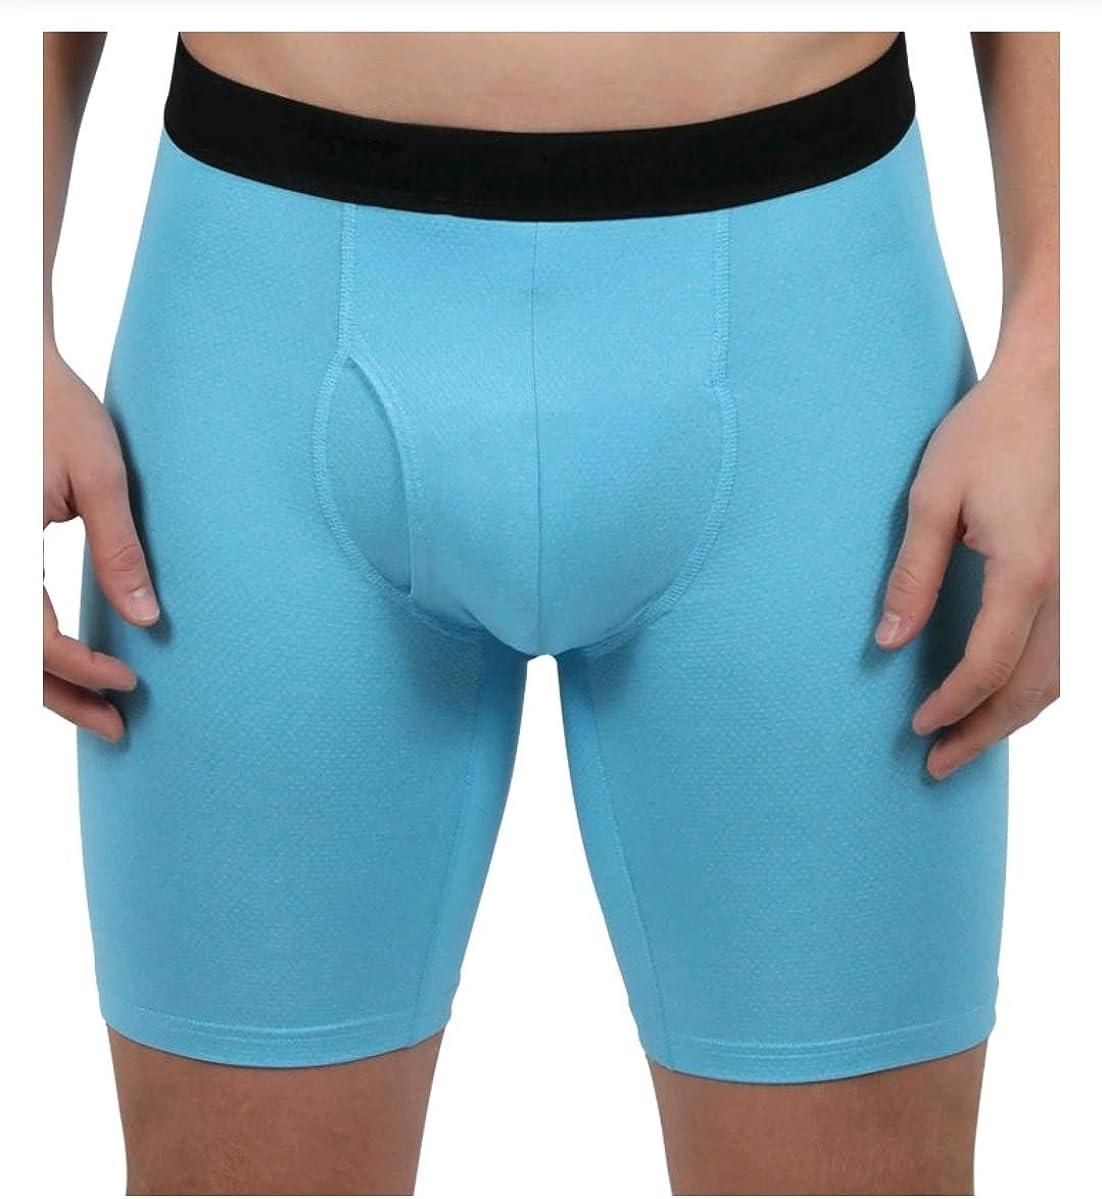 Athletic Works Aqua Wave/Blue Cove/Charcoal 3 Pack Performance Mesh Boxer Briefs